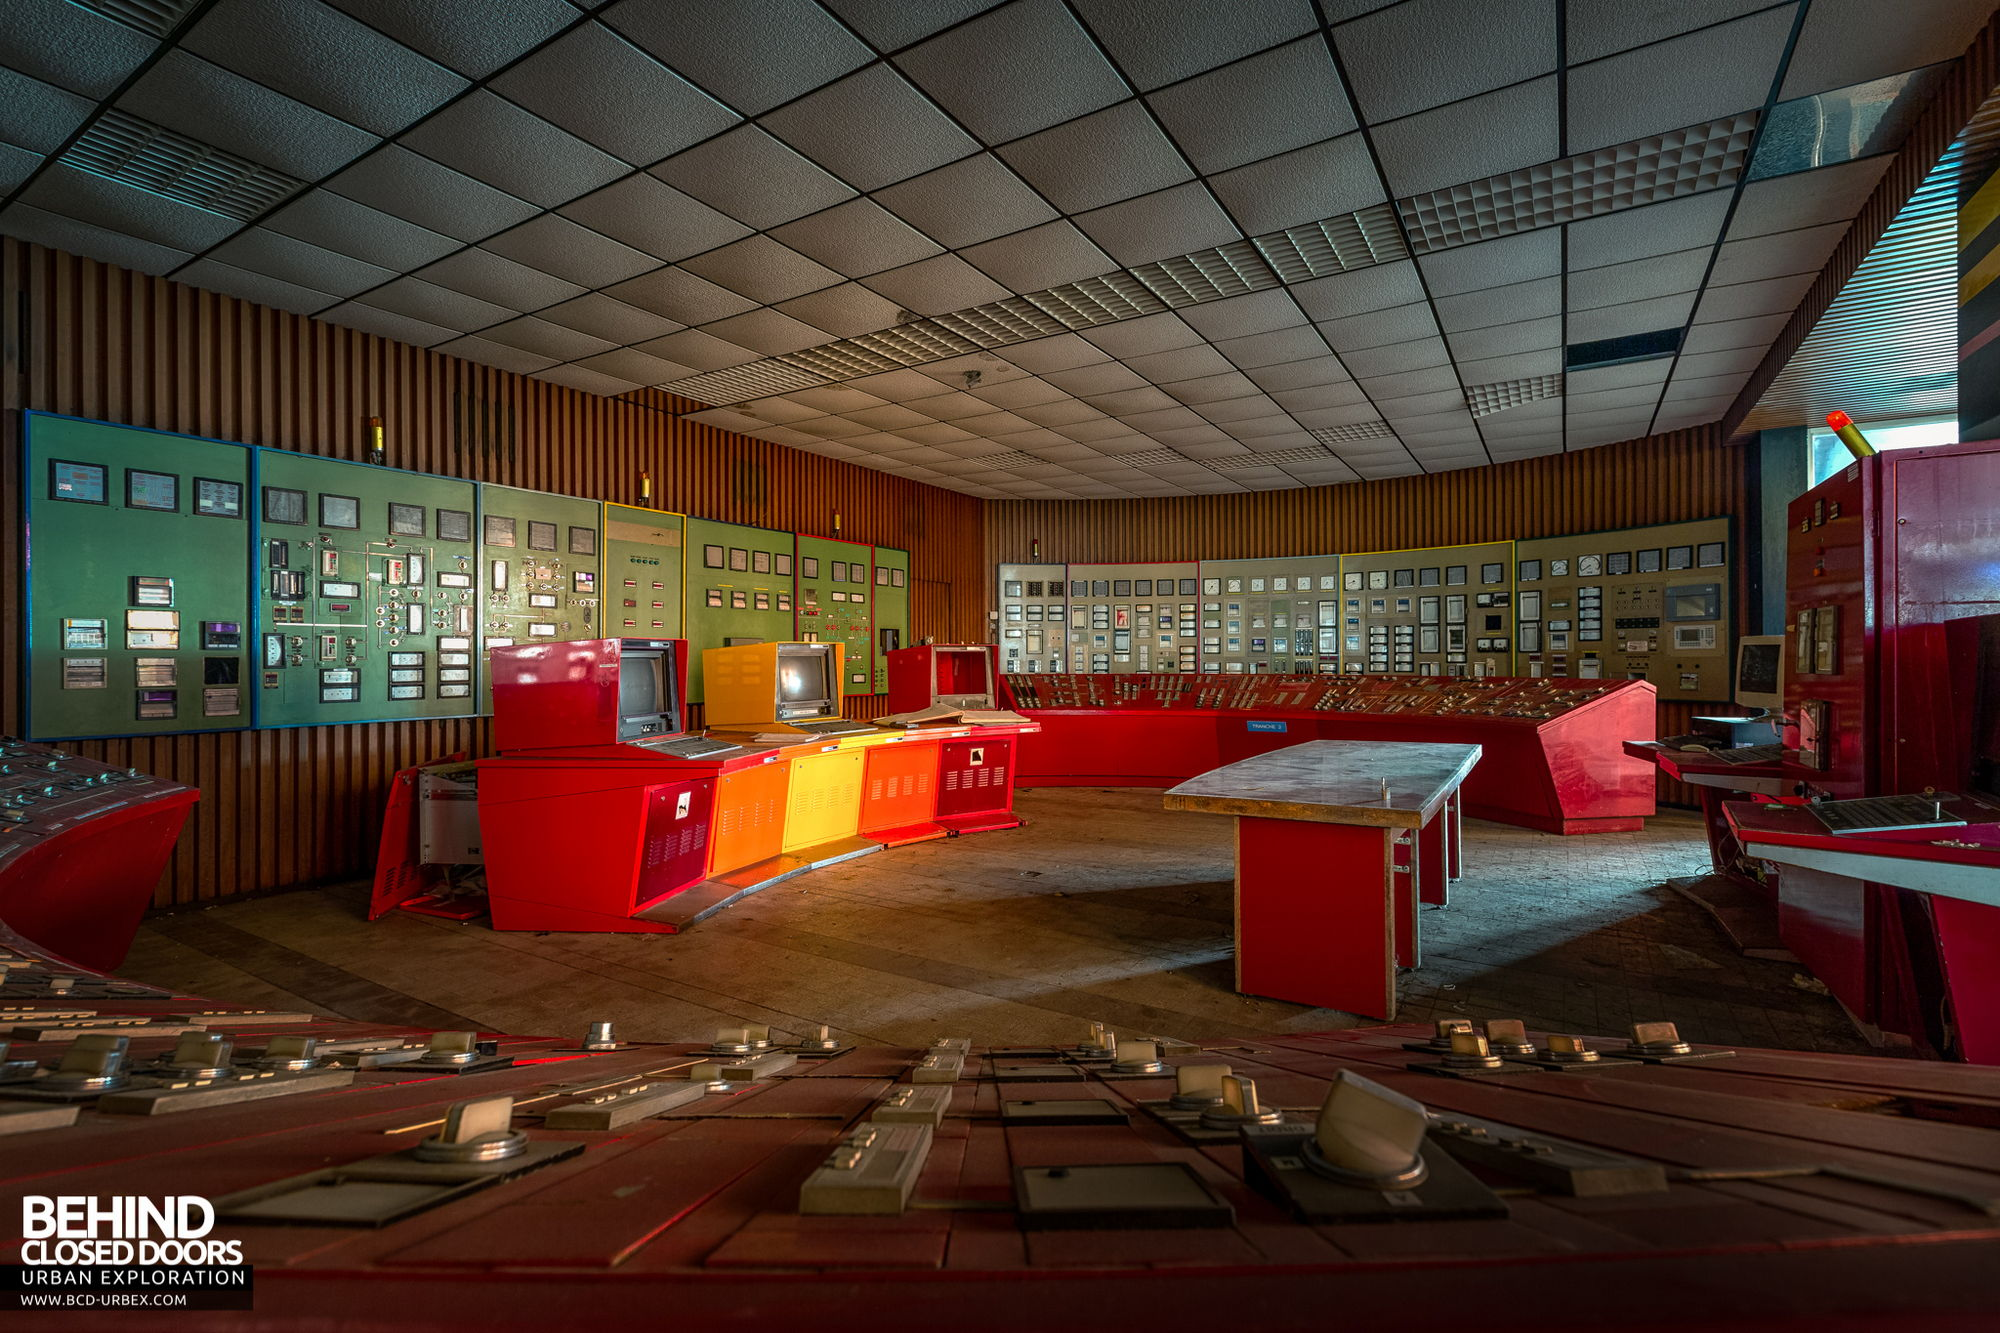 Stora Enso, Corbehem - Power station control room